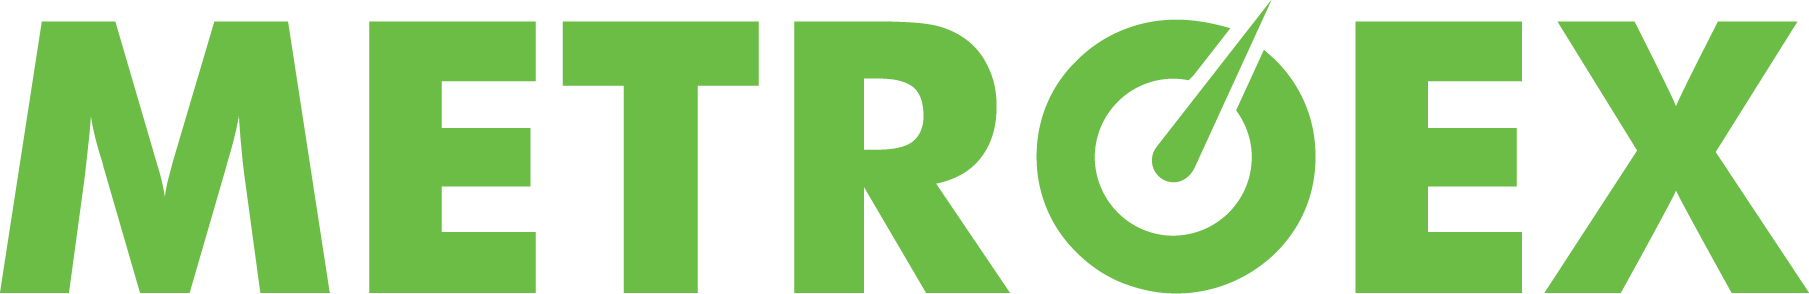 Metroex-Logo-Oficial